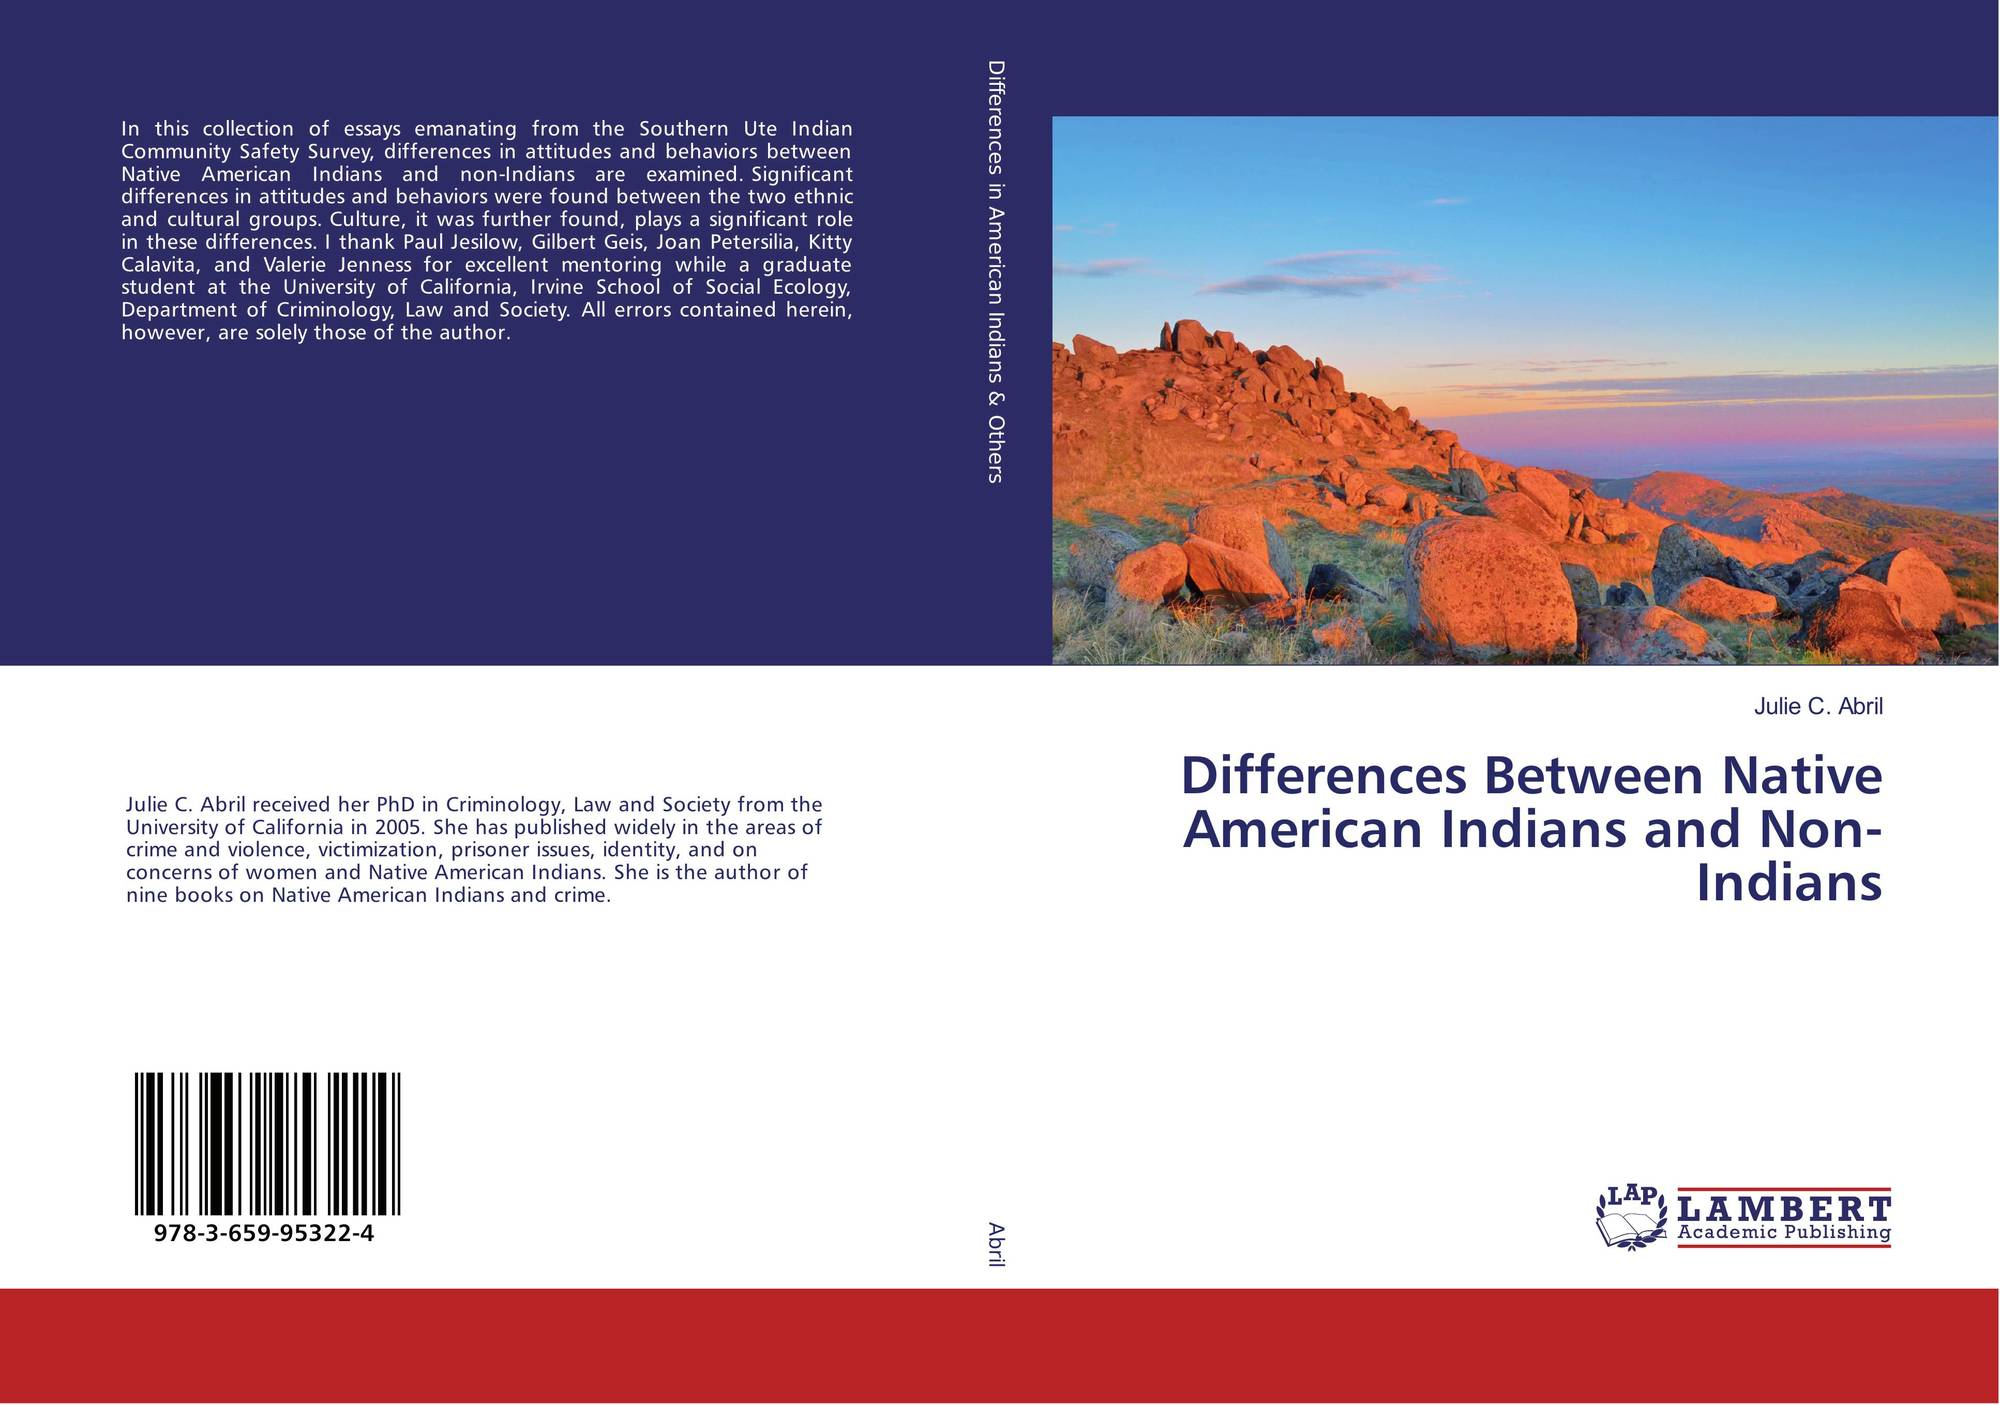 differences between iroquois and pueblo indians What is iroquois 100 what is pueblo 500 they lived in an area with a surprisingly mild climate lakota, inuit, kwakiutl, iroquois, pueblo.